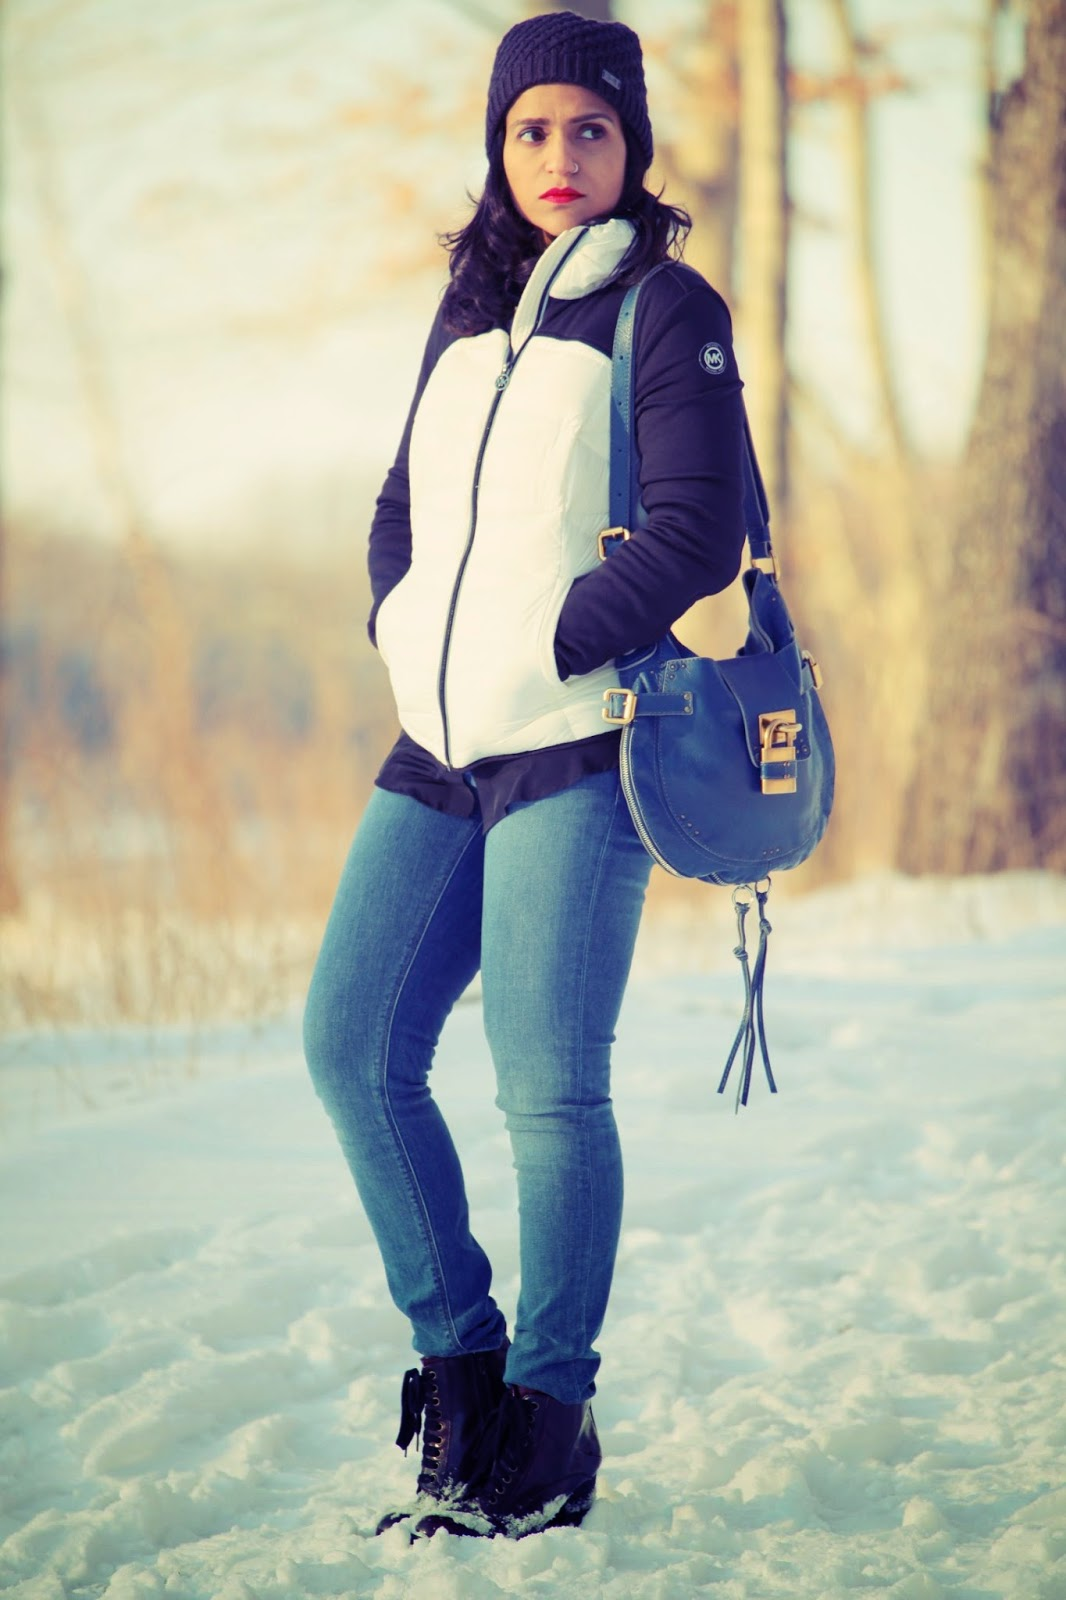 Beanie - Under Armour Sweater - C. Wonder Shirt - Cut X 2 Jeans - Zara  Boots - Steve Madden Jacket - Michael Kors Tanvii.com